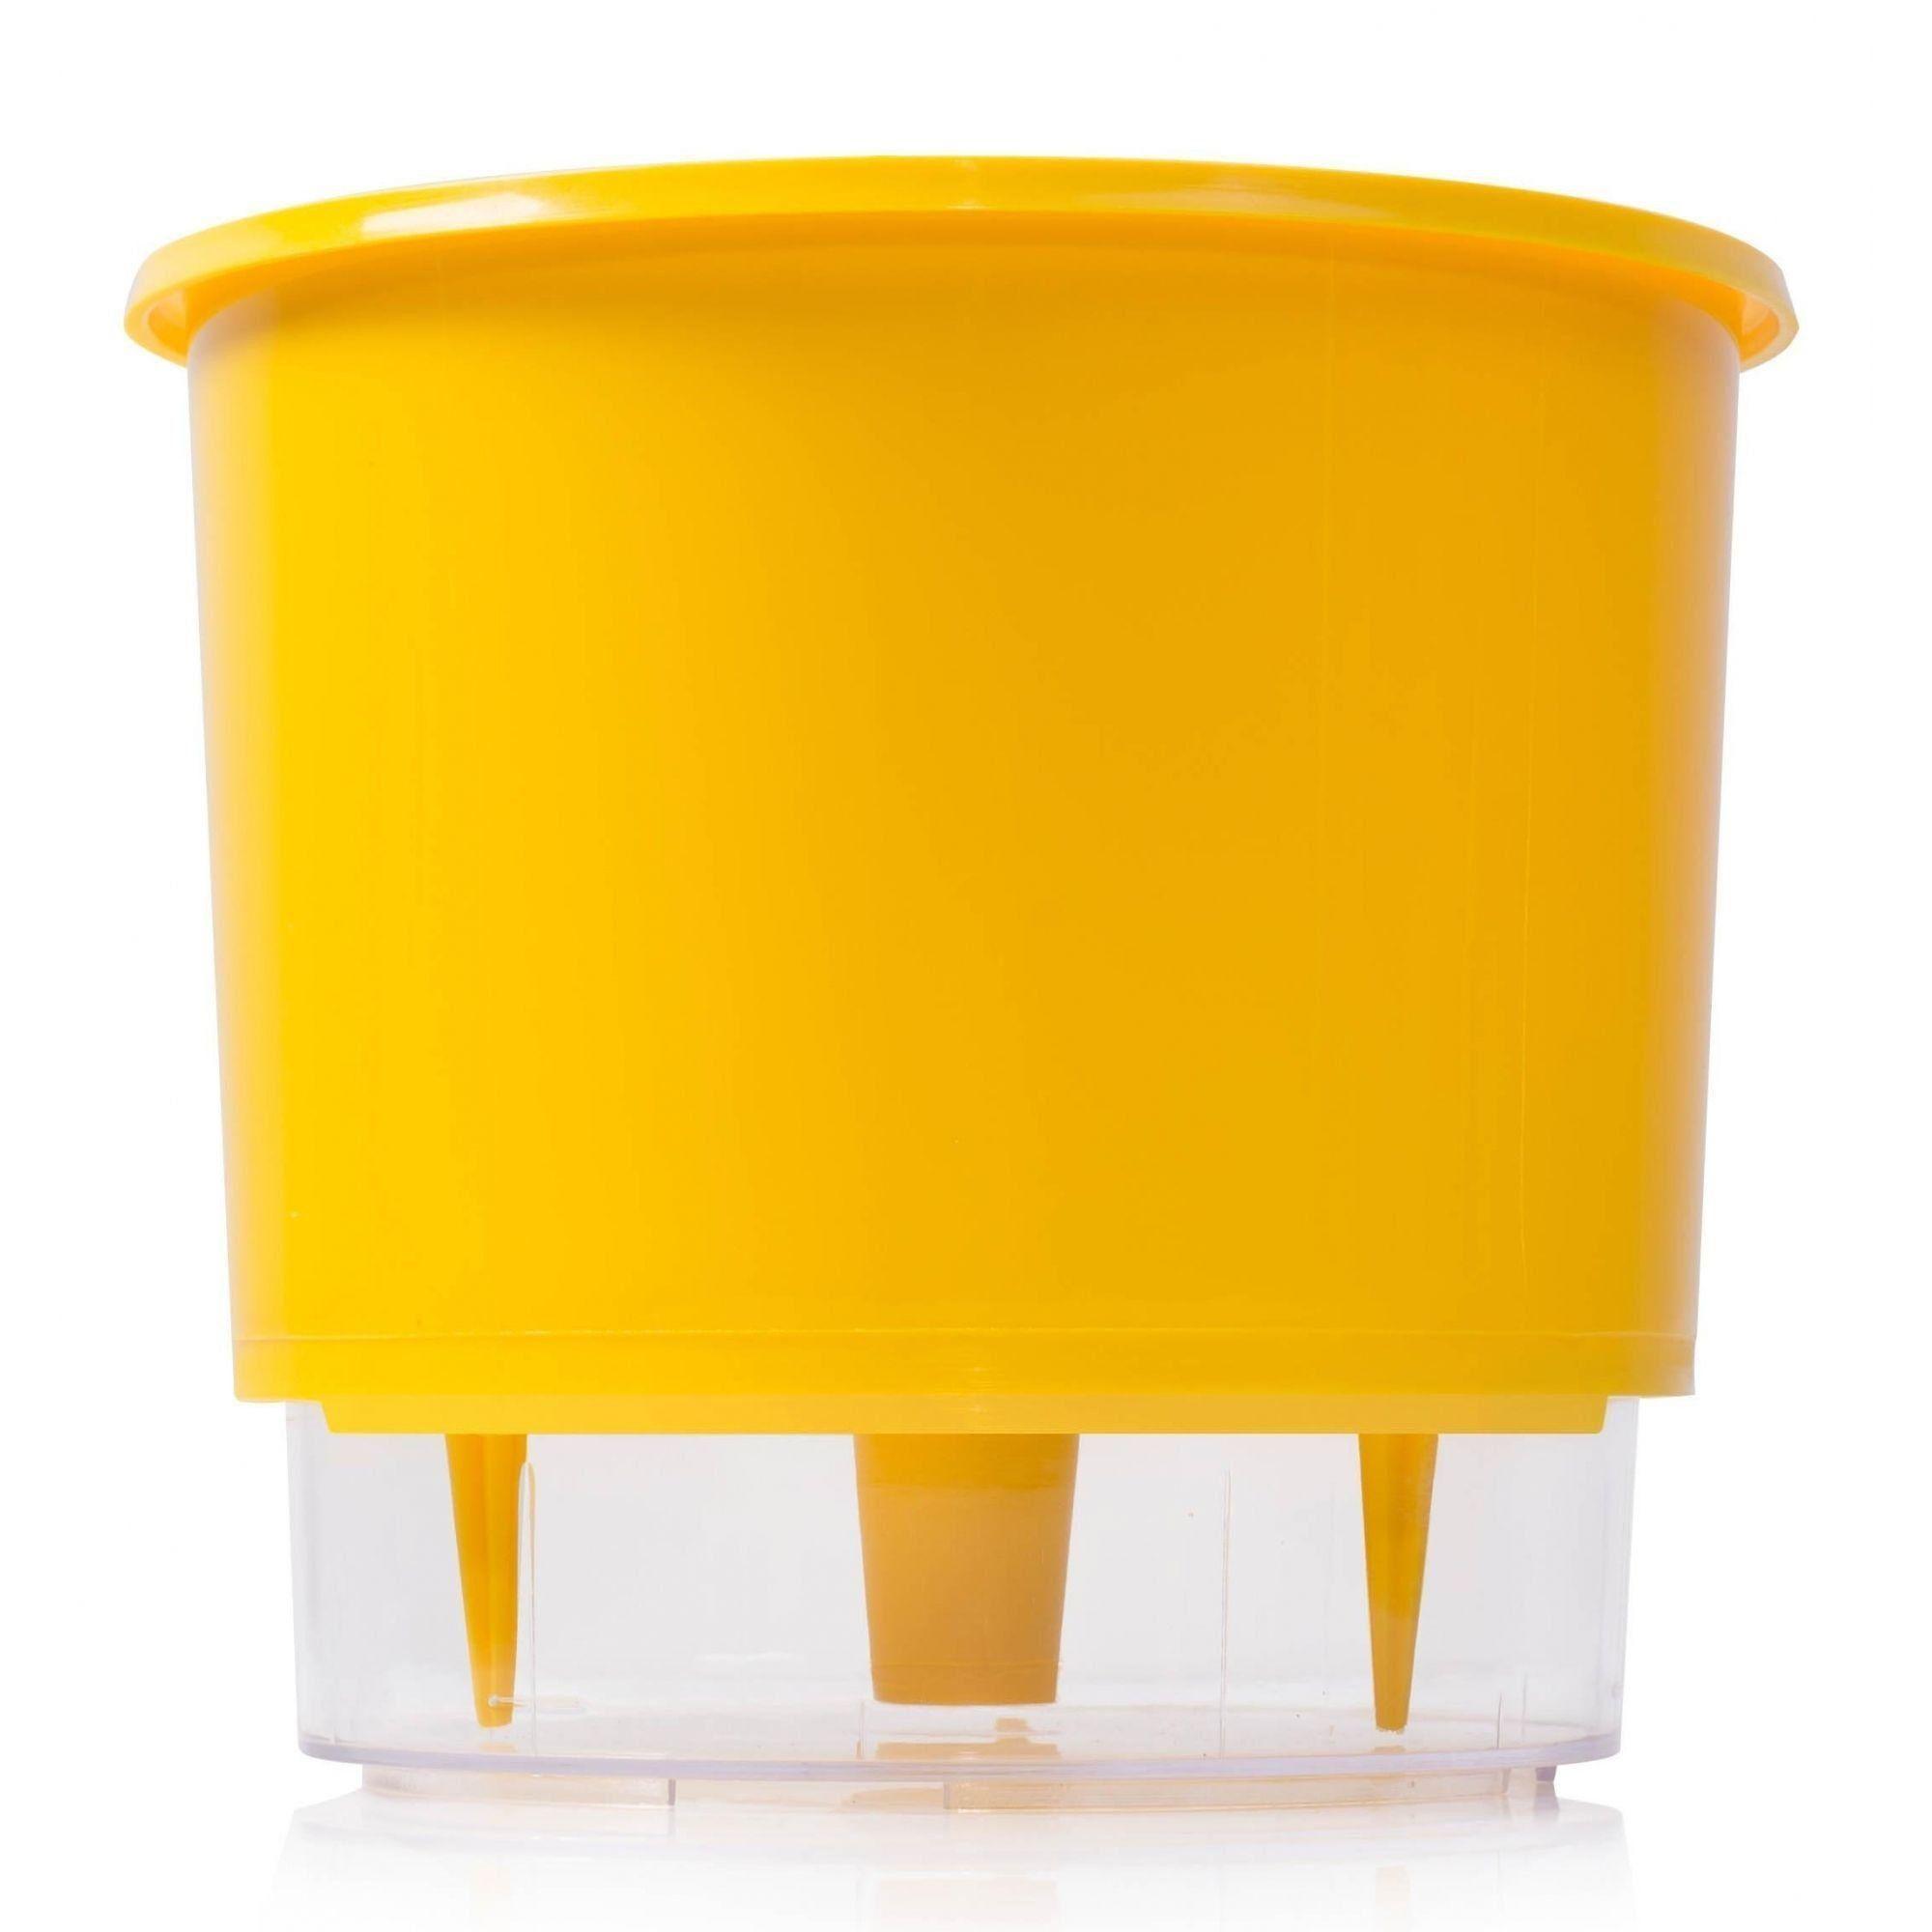 Vaso Autoirrigavel 02 Amarelo